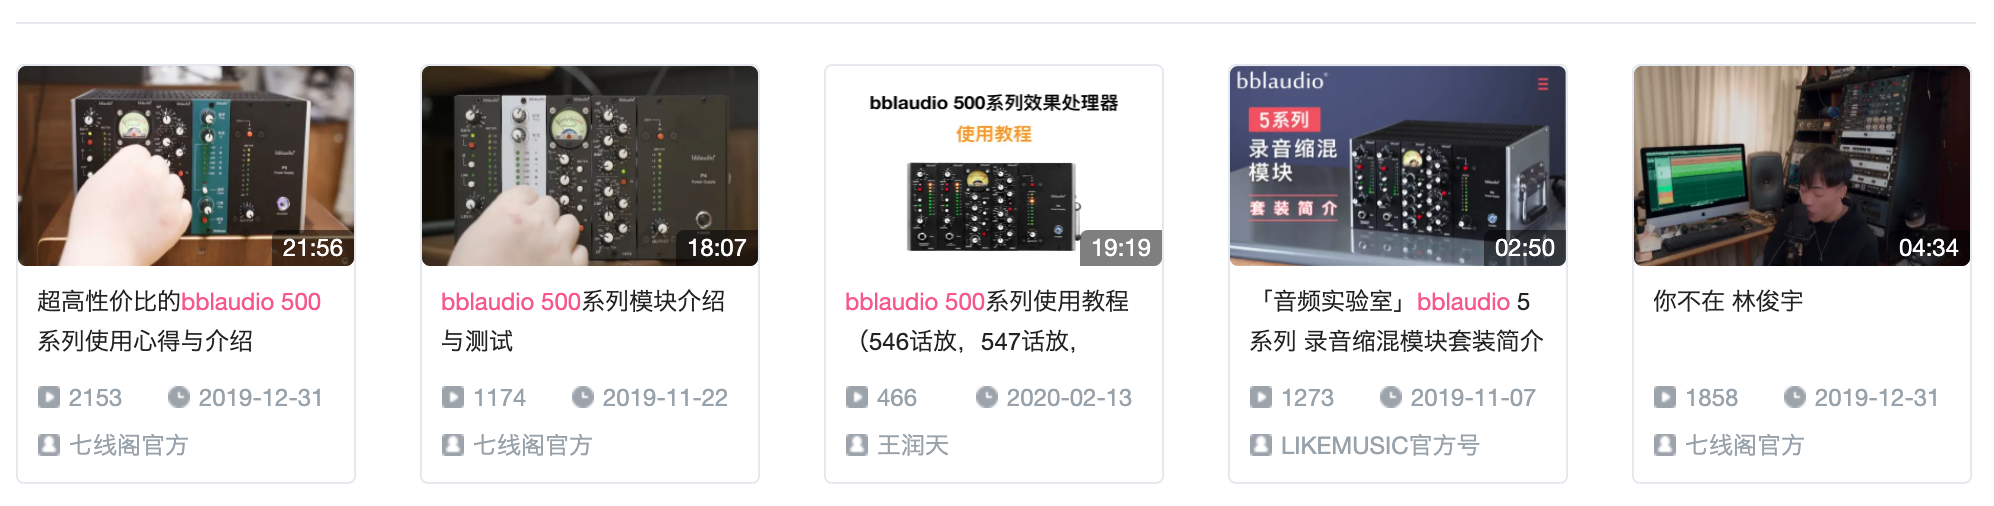 bblaudio 500 up主